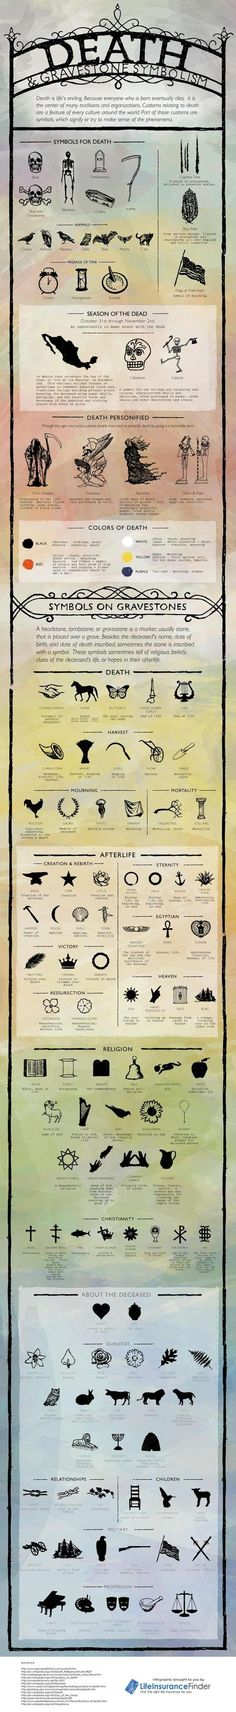 Occult Symbols + Sigils: Death and Gravestone Symbolism | #Occult #Symbols #DeathSymbols